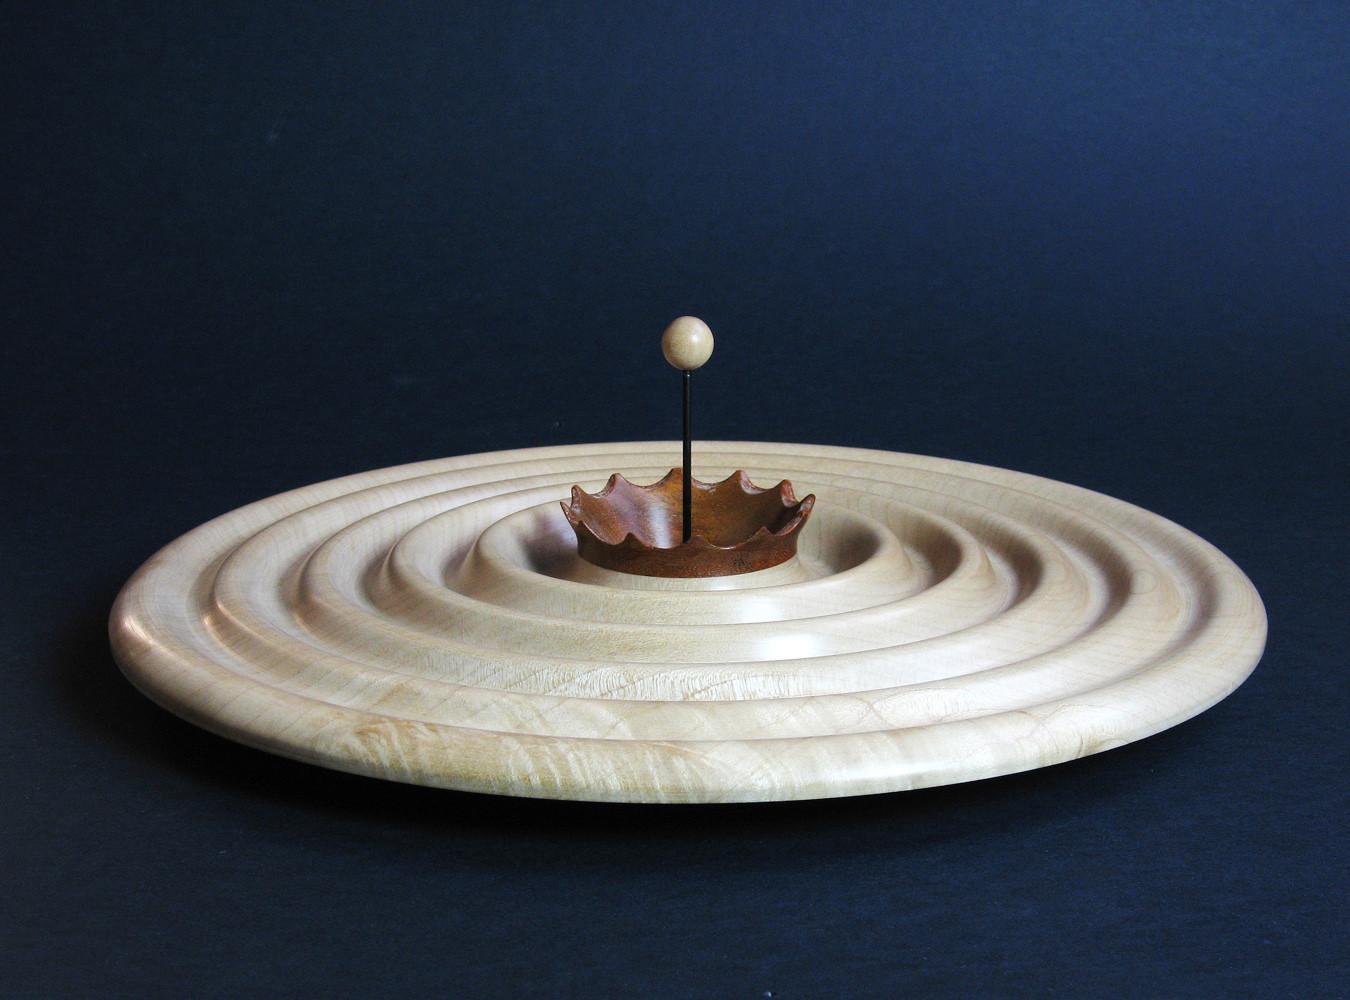 Woodcraft -09.jpg